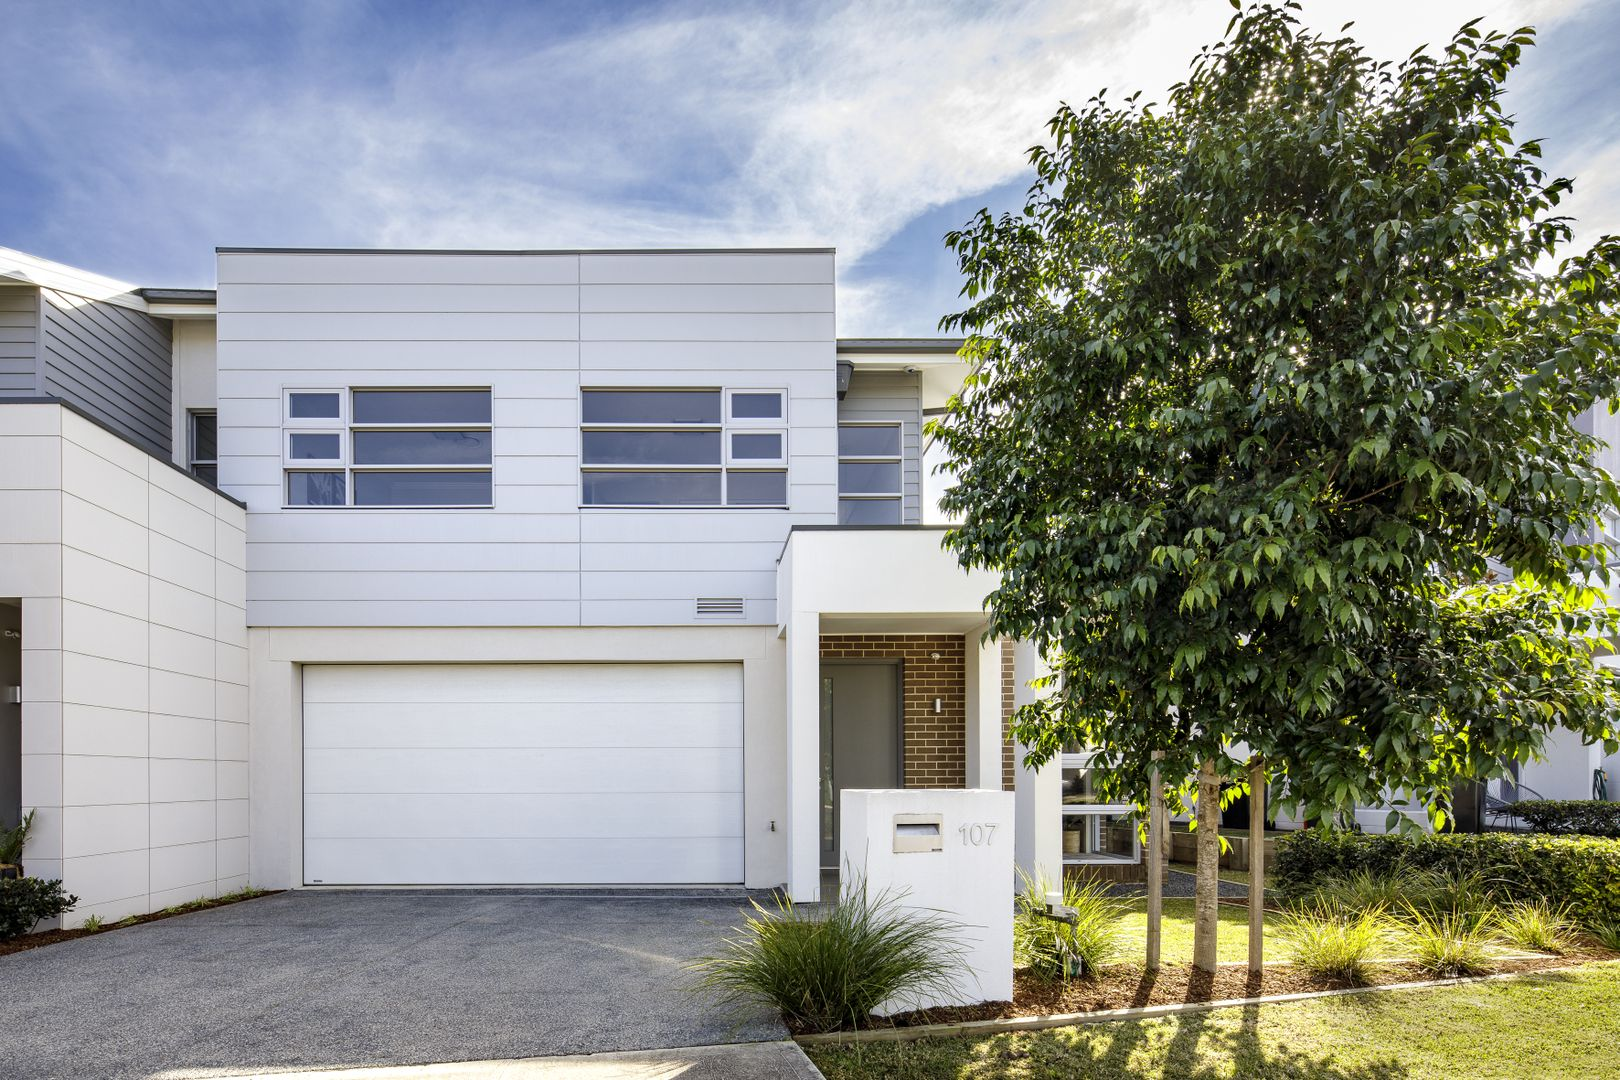 Lot 42/41 Aspect Cres, Glenmore Park NSW 2745, Image 0